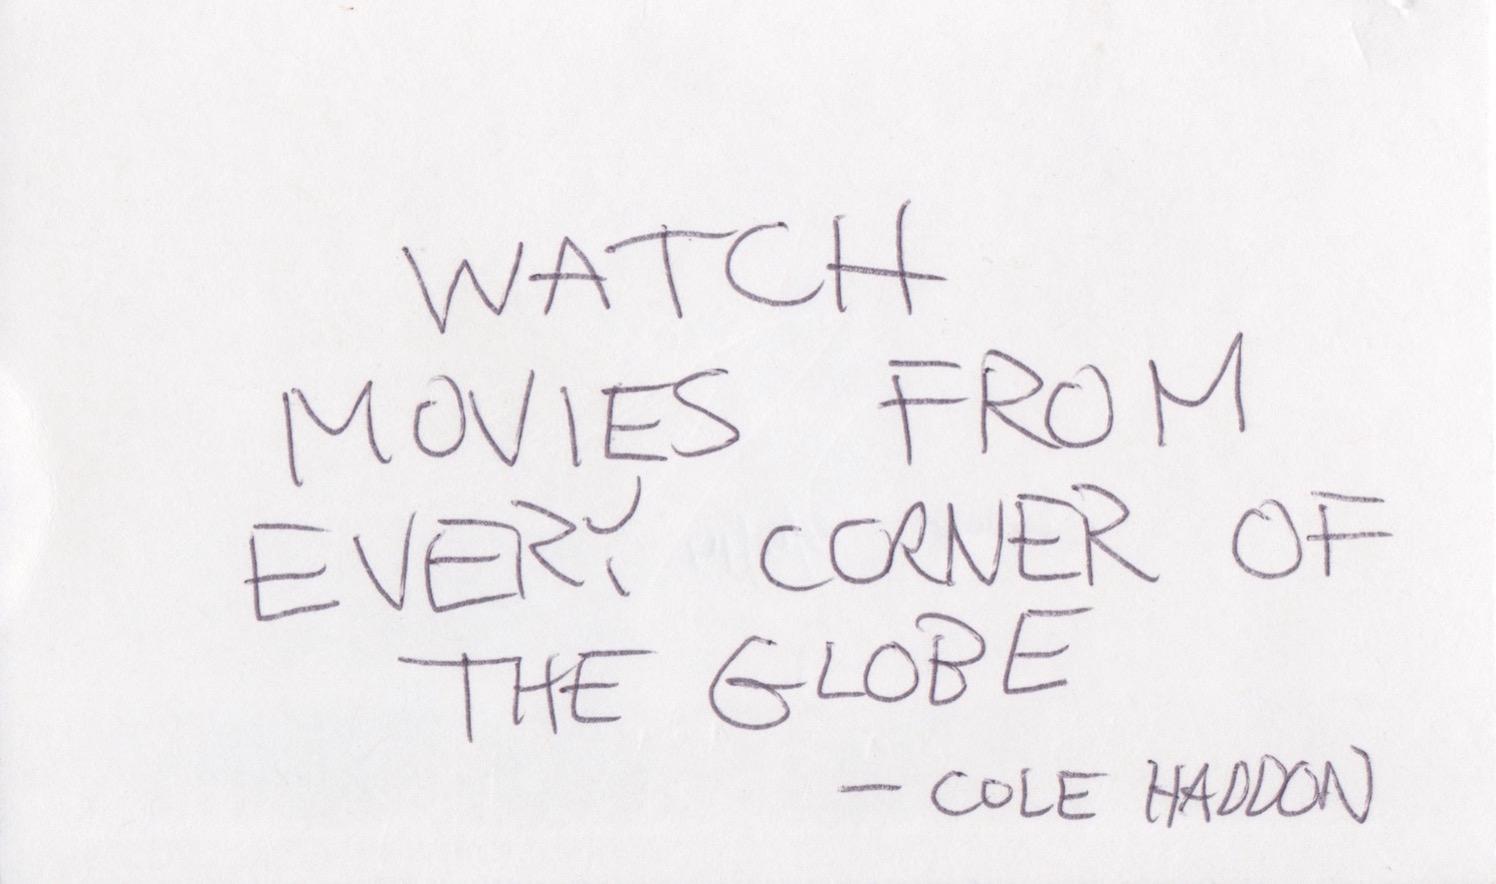 Cole Haddon